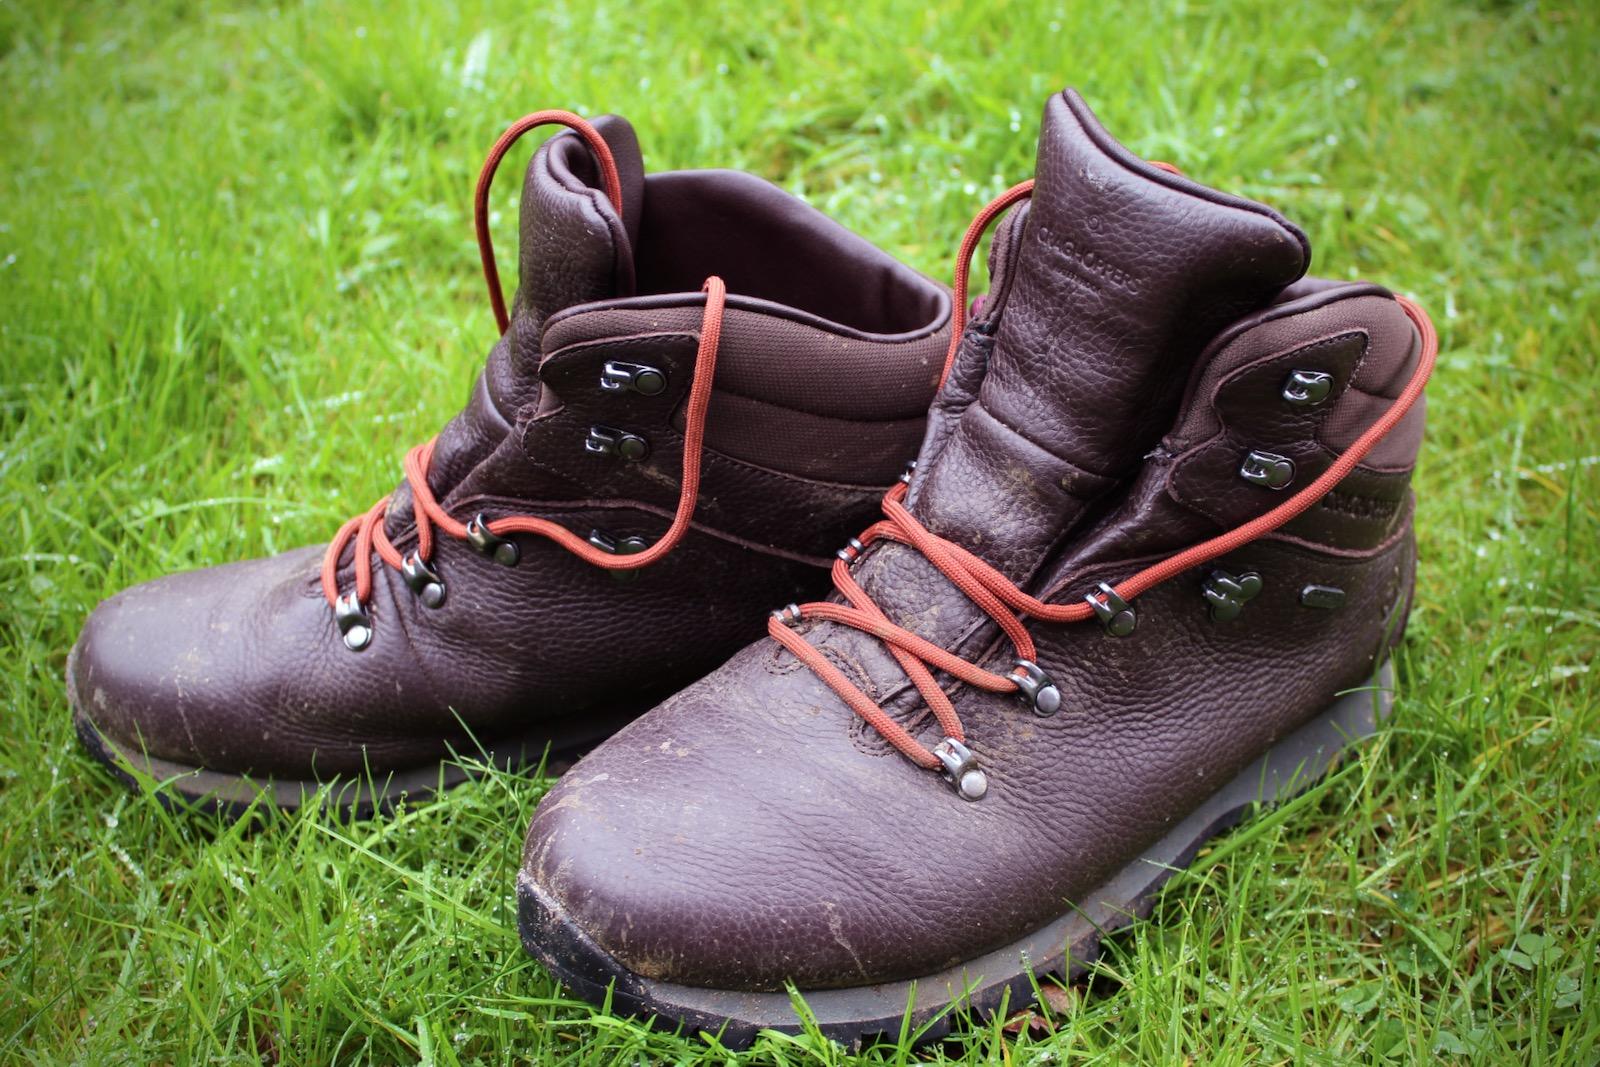 Craghoppers Kiwi Trek Boots review